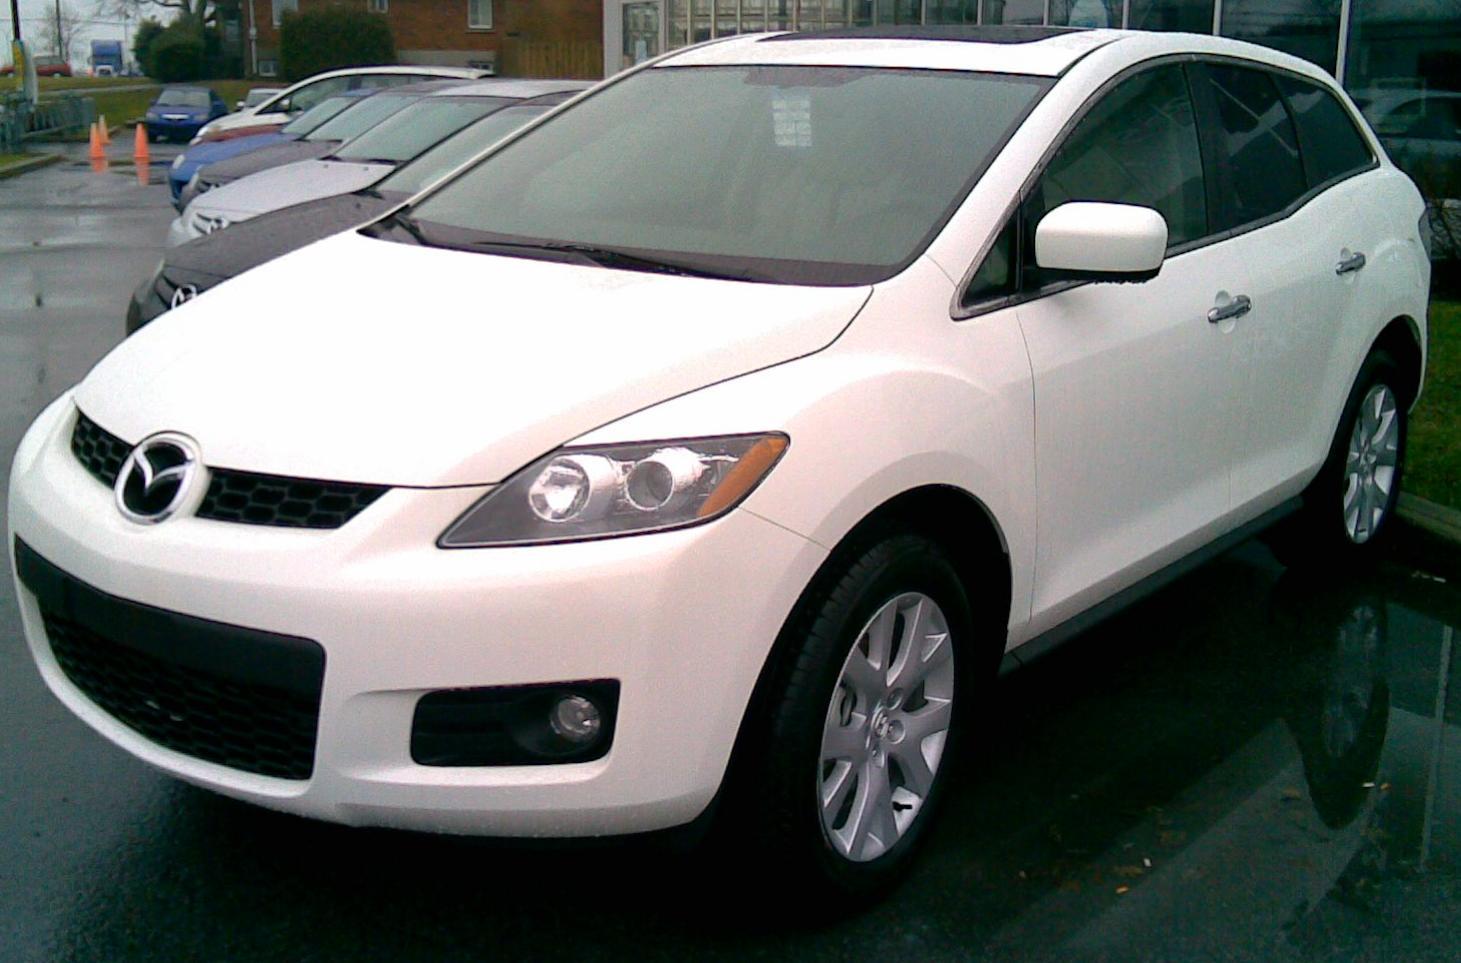 Mazda-CX7-Turbo-Problems-Solutions-Replacement-Preventative-Maintenance